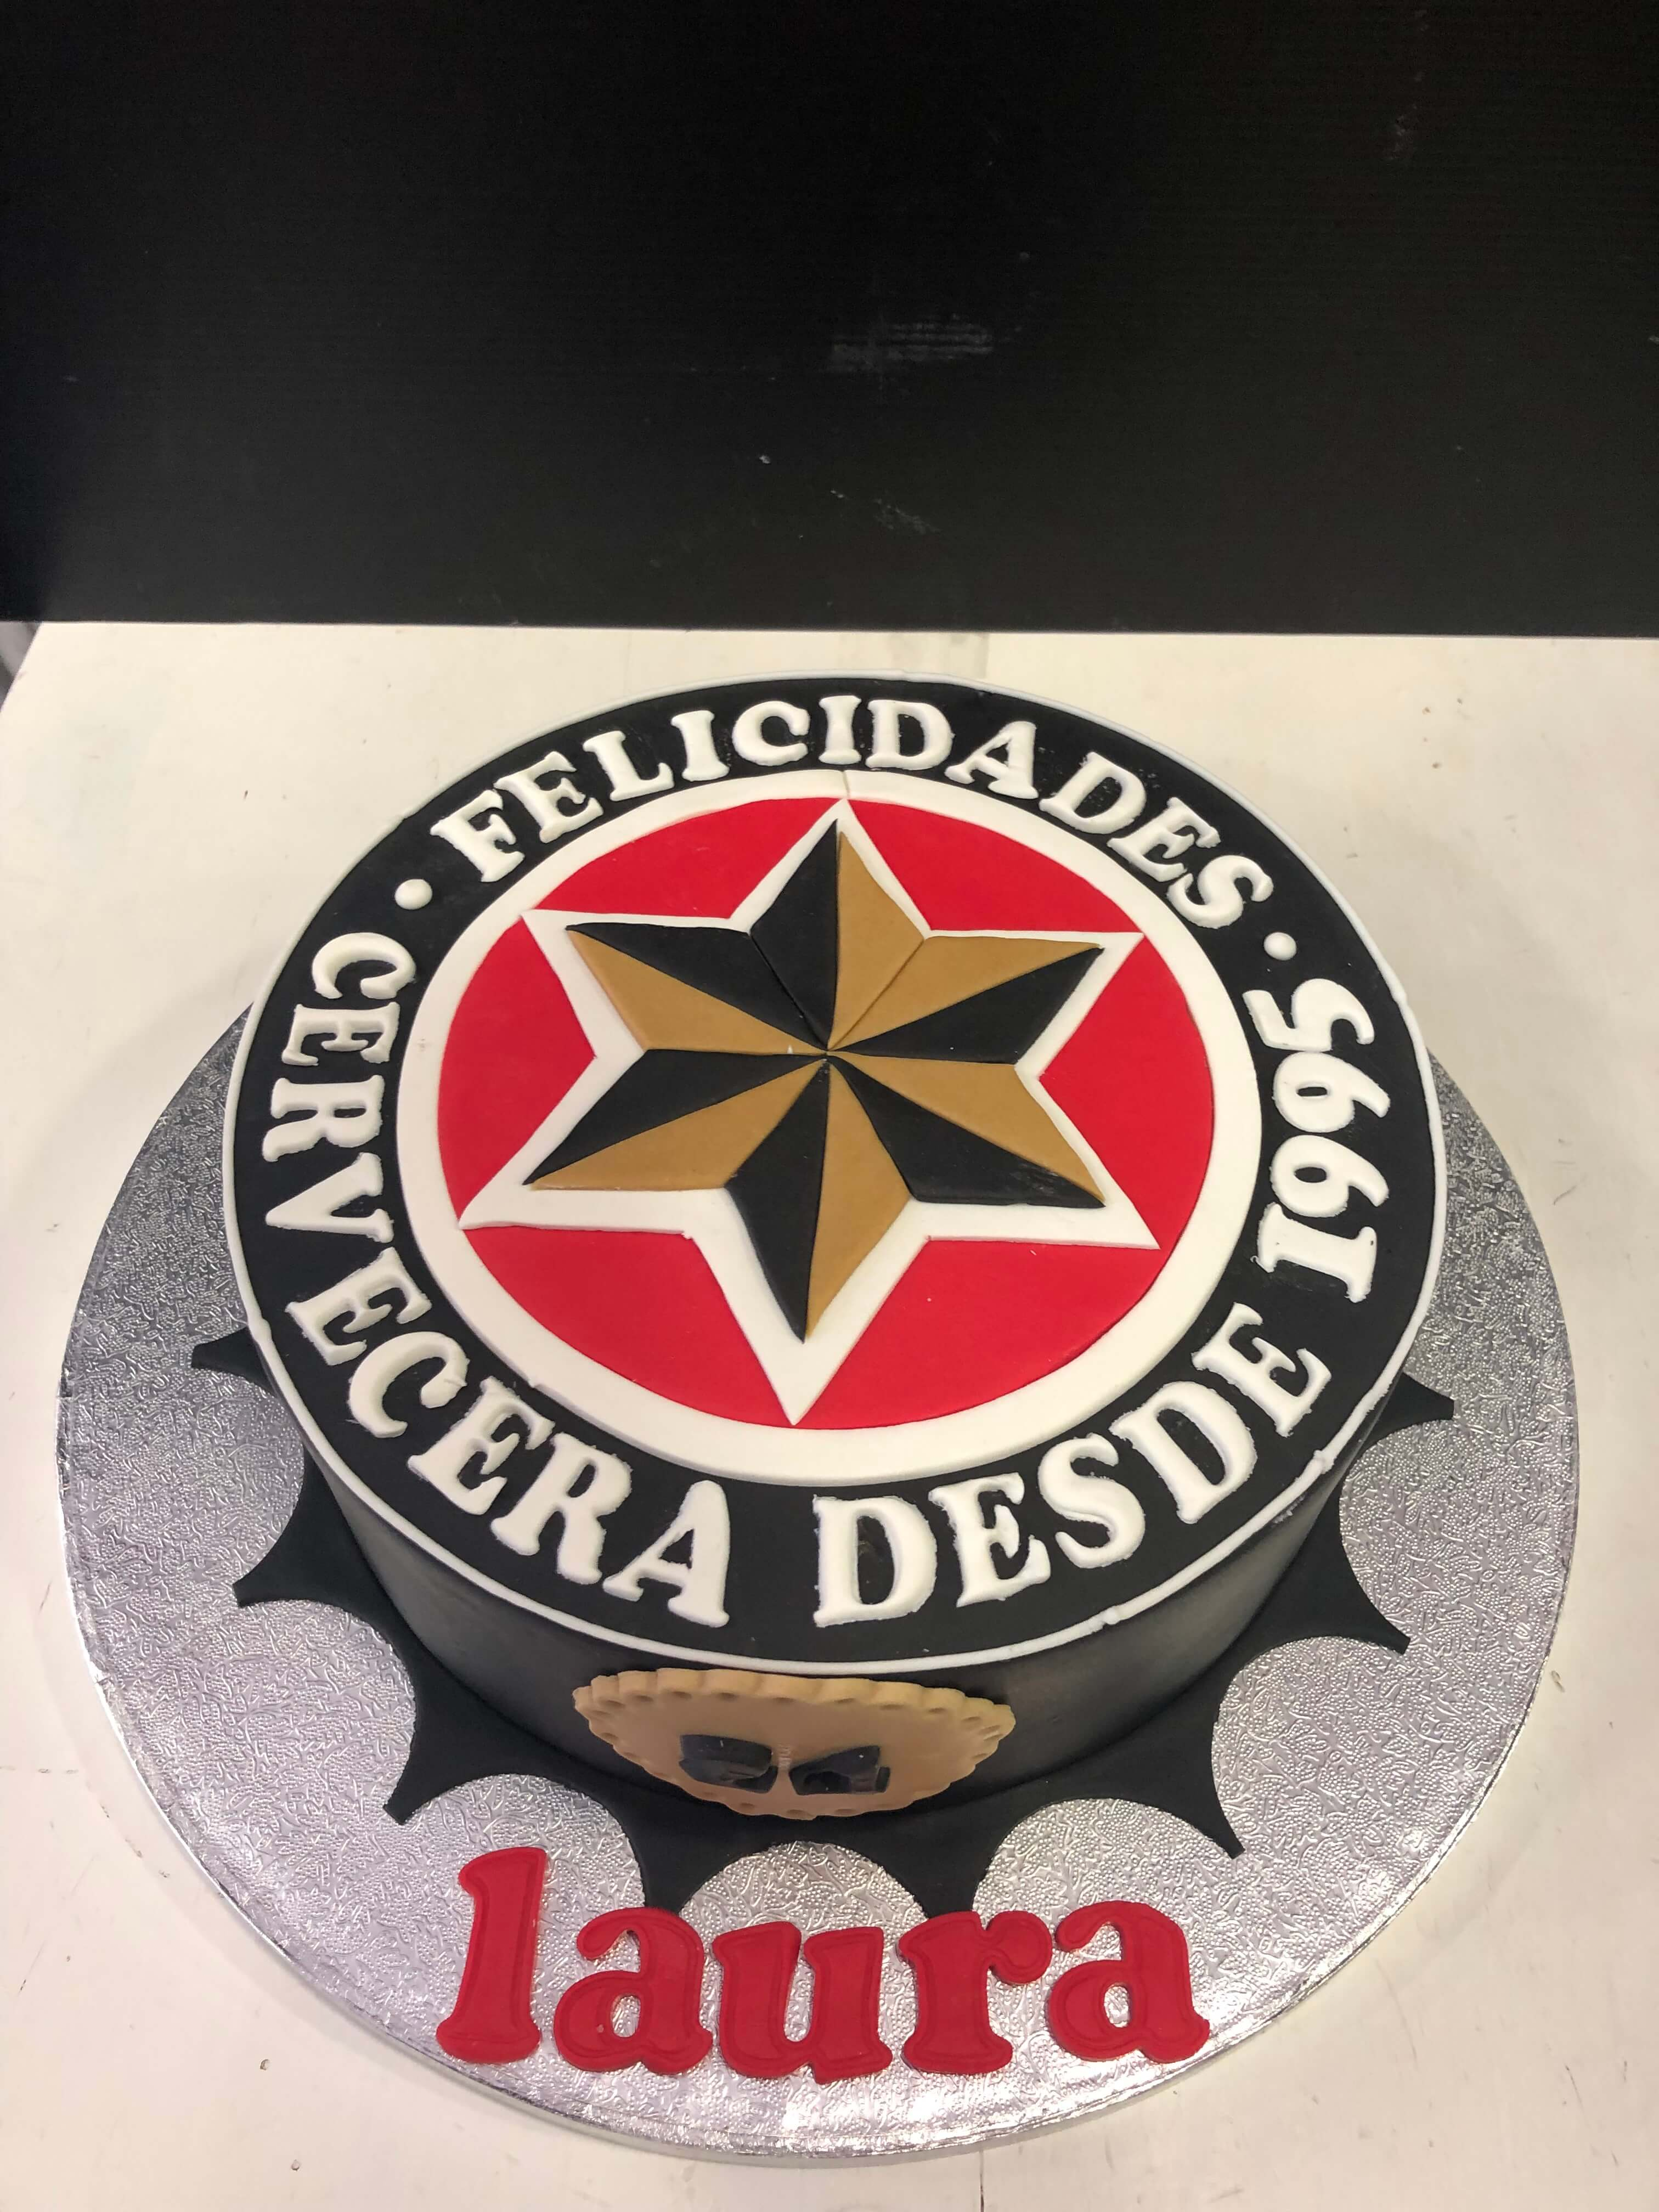 Tarta estrella Galicia chapa coruña cerveza